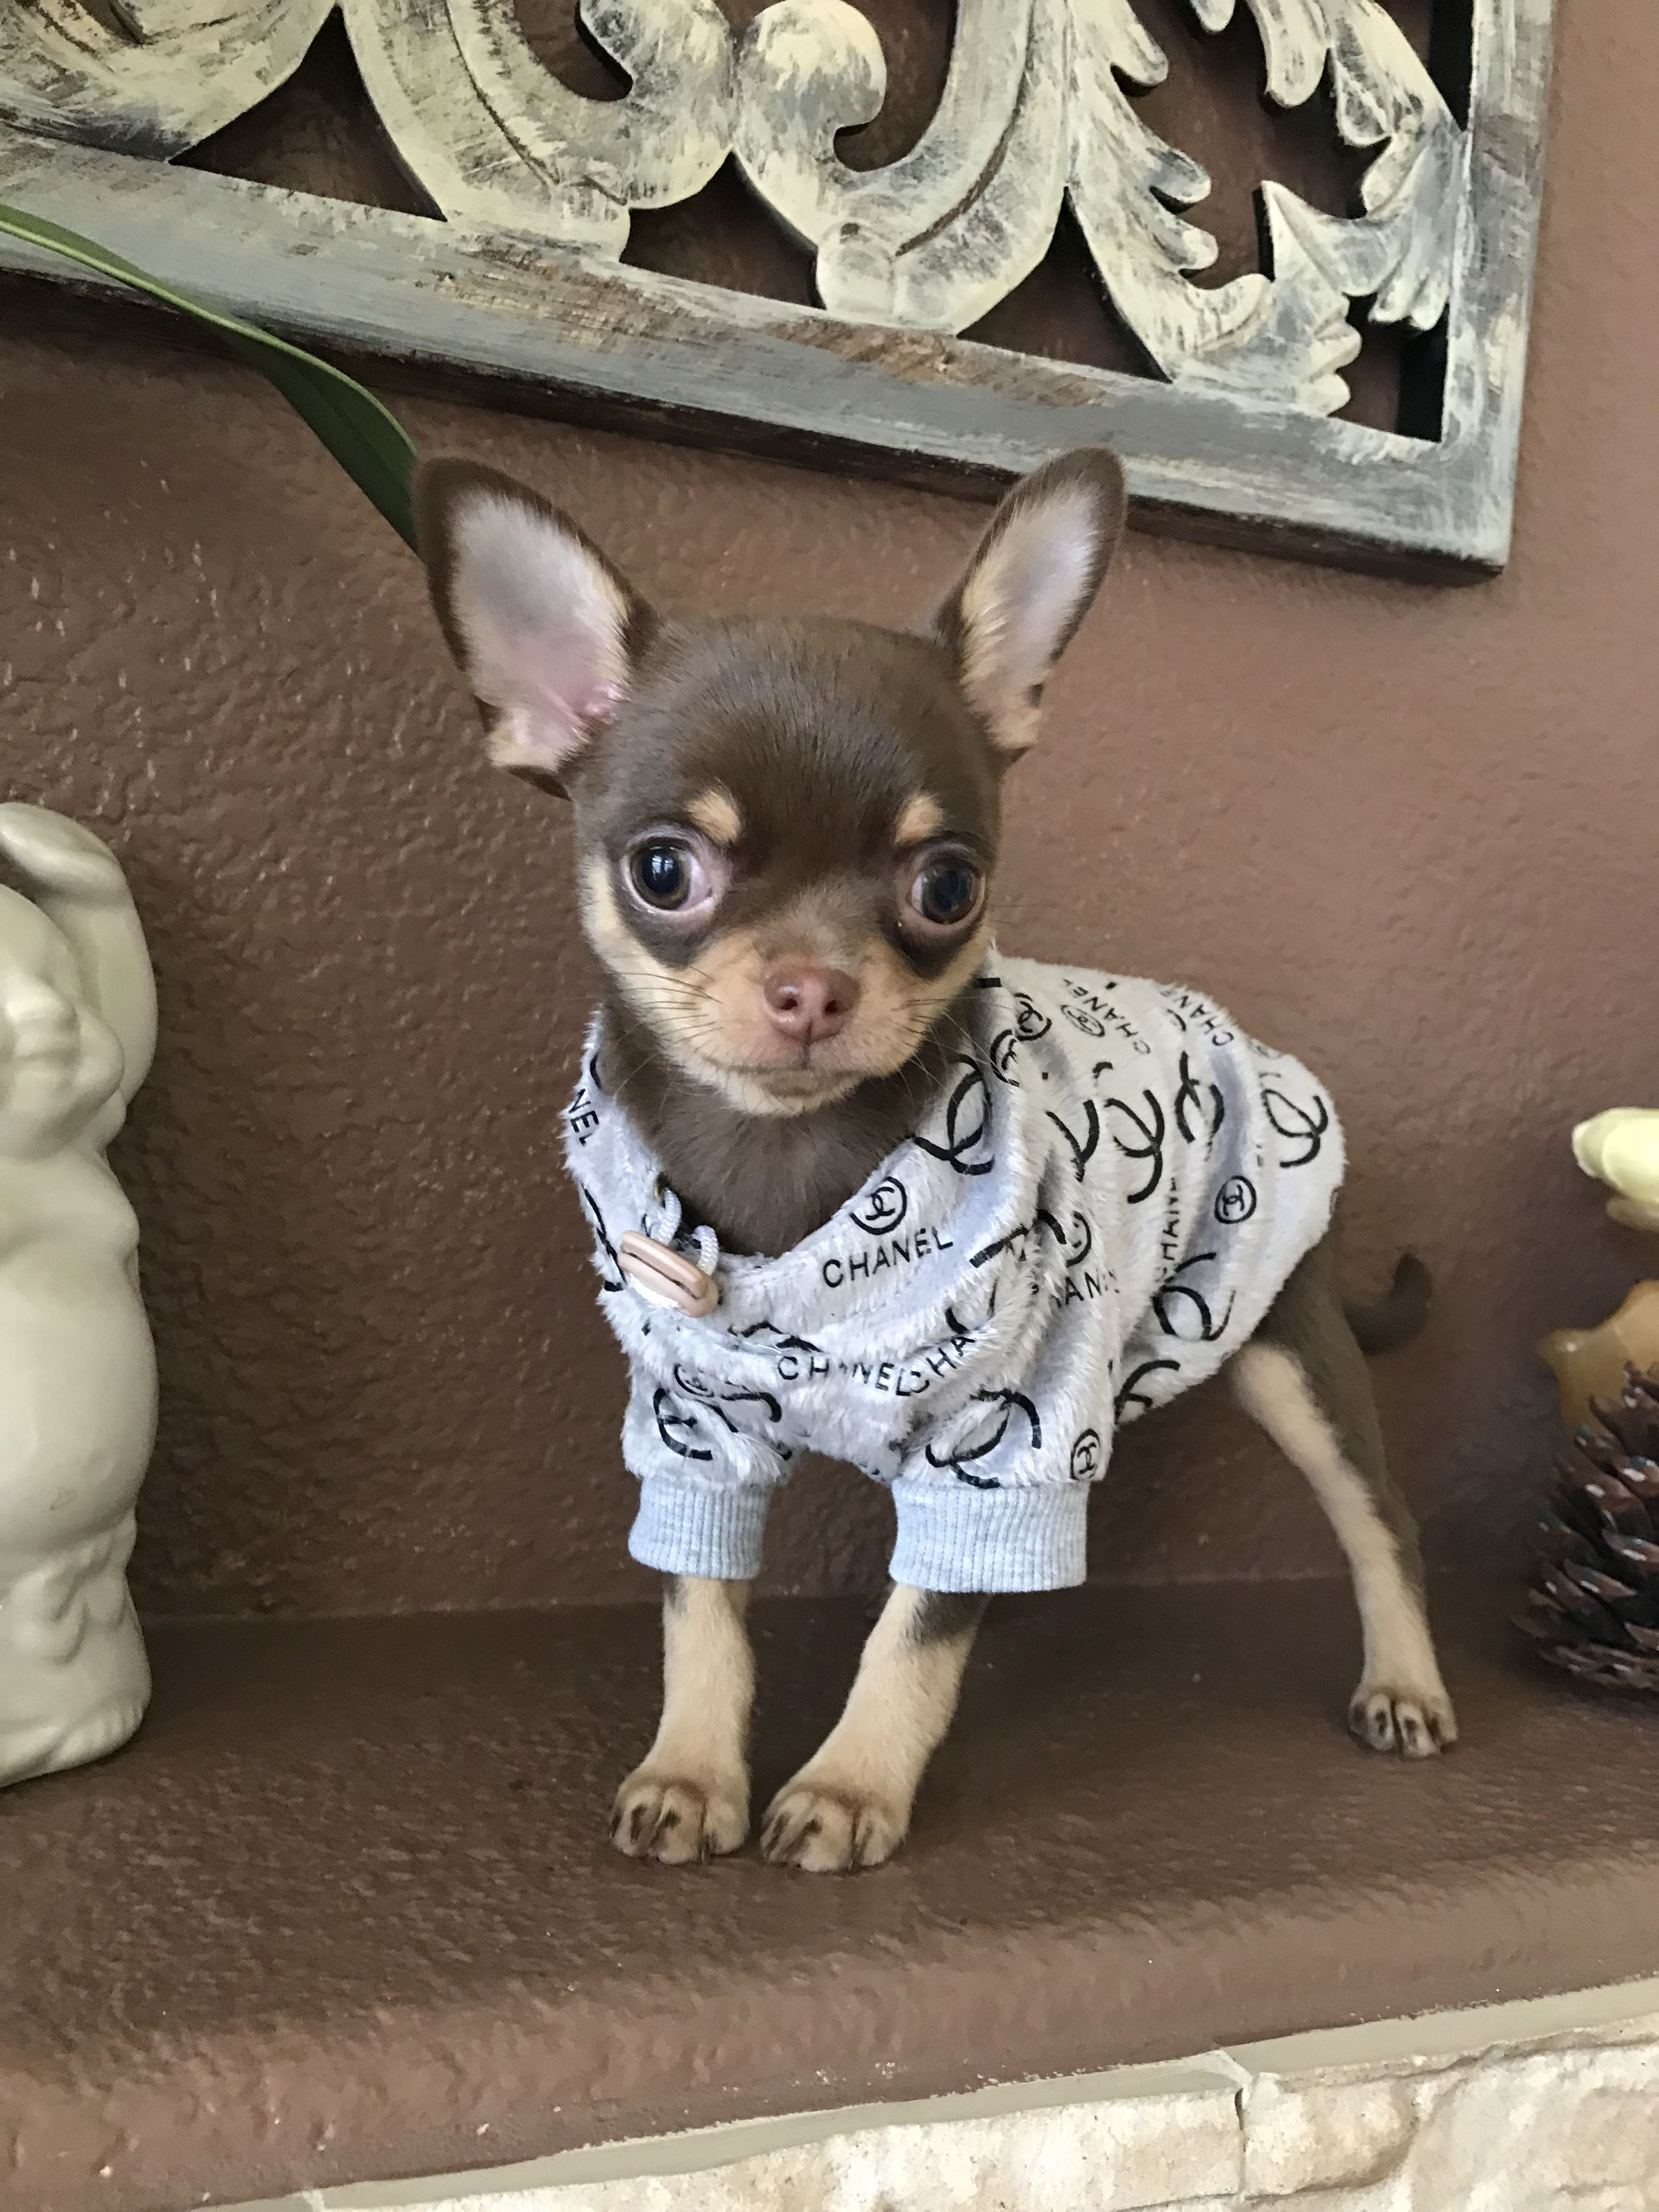 Pin By Las Vegas Tiny Chihuahua On Chocolate Chihuahuas Puppies